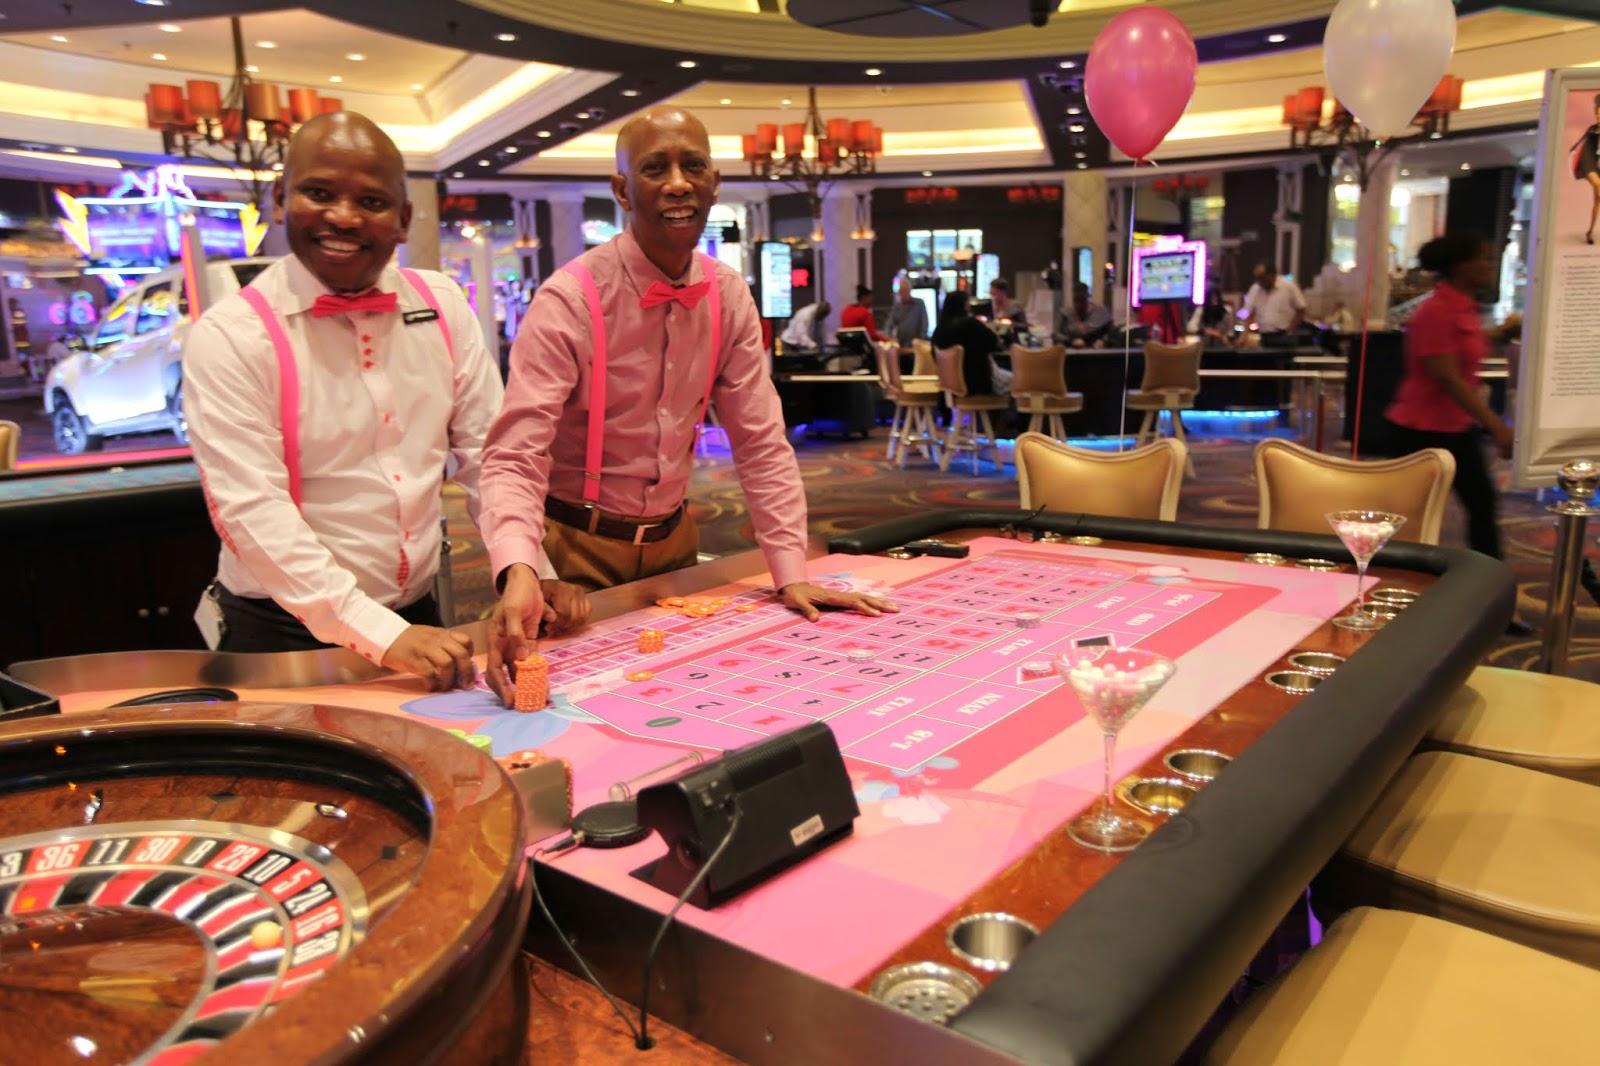 Silver star casino table games casino casino gaming online